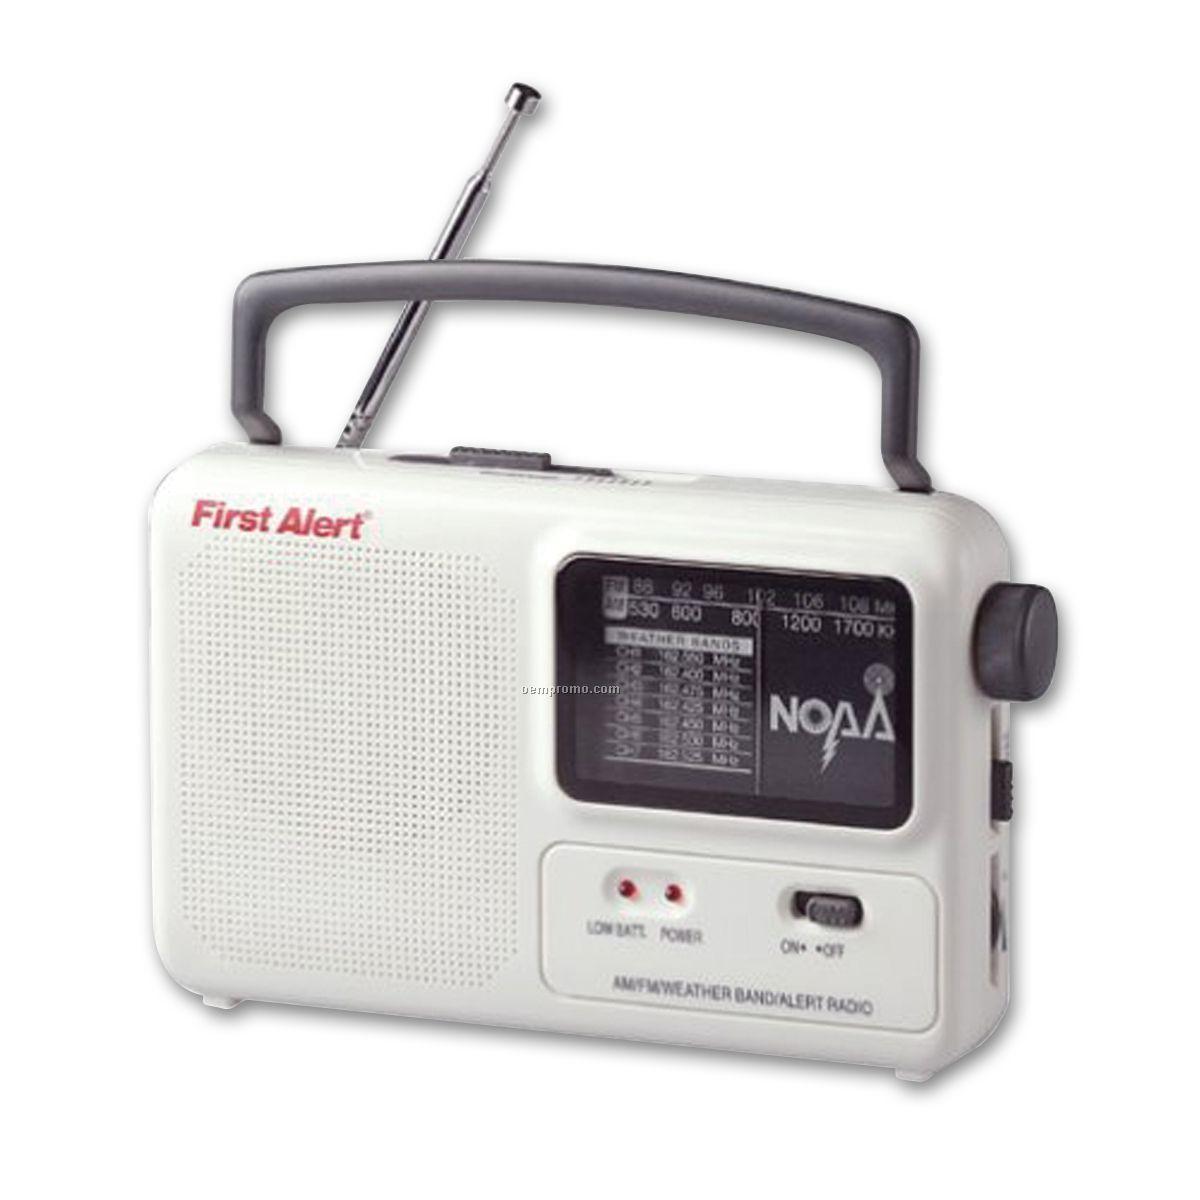 First Alert Noaa Emergency Alert Radio